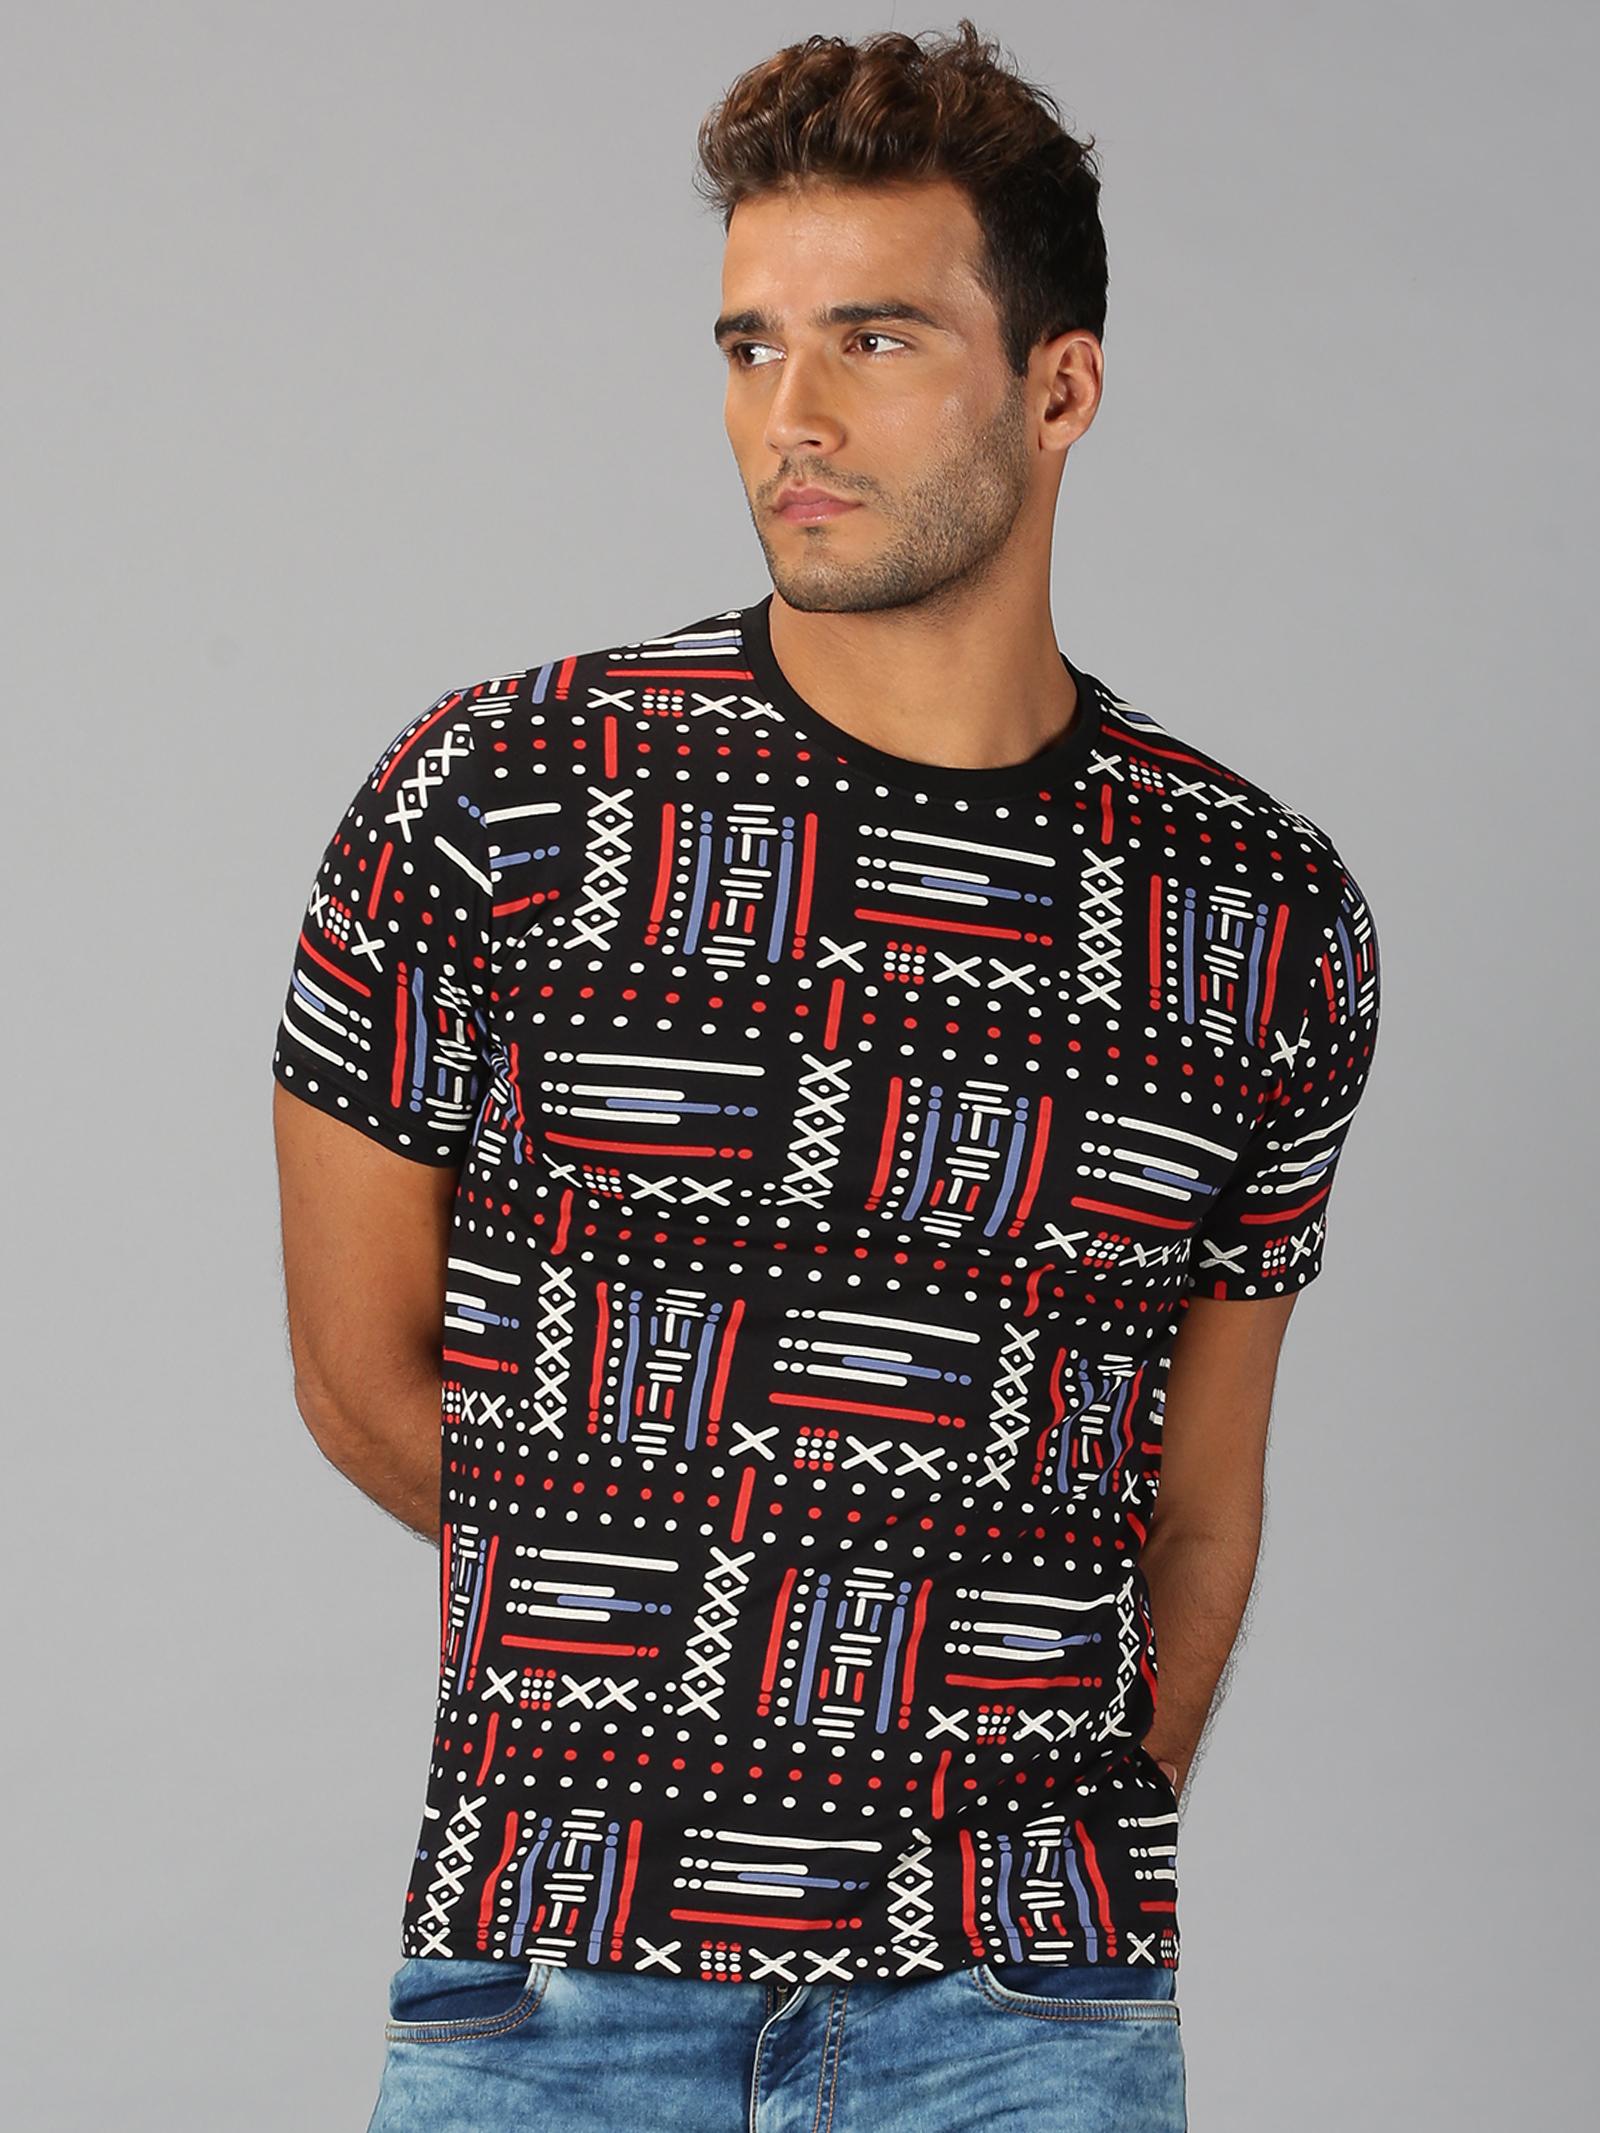 UrGear | Mens Round Neck Printed Black T-Shirt